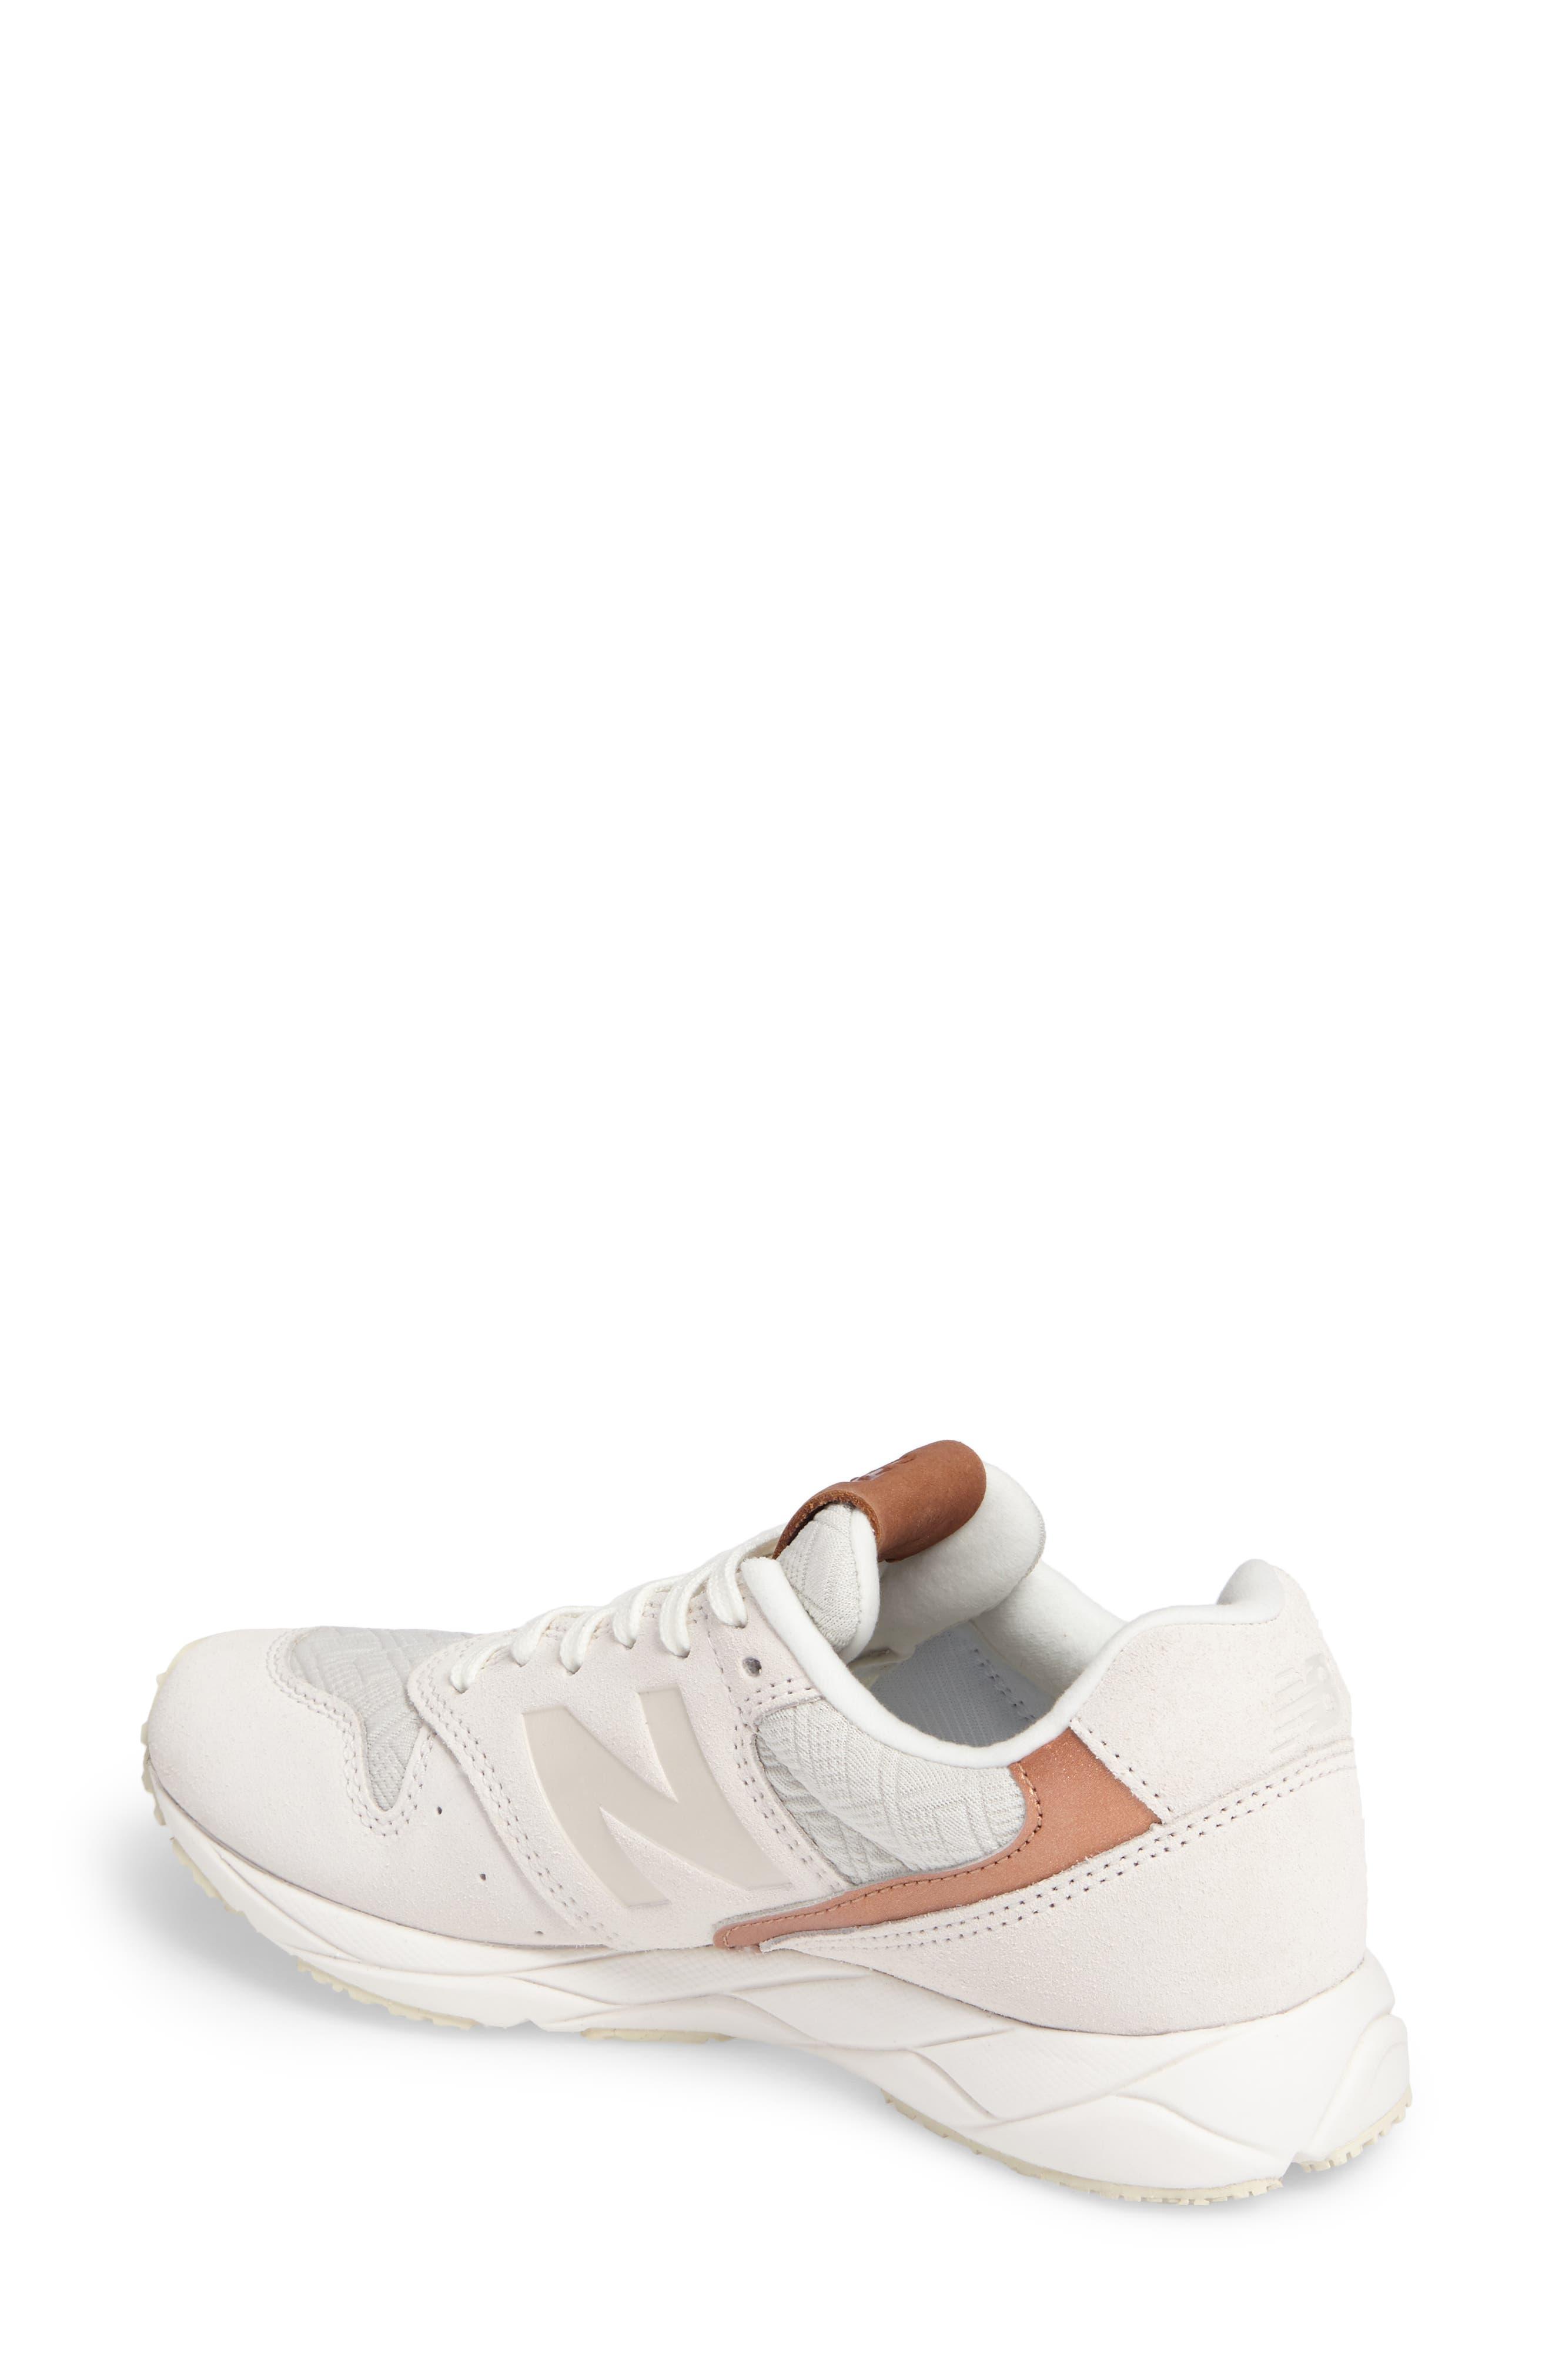 96 Mash-Up Sneaker,                             Alternate thumbnail 8, color,